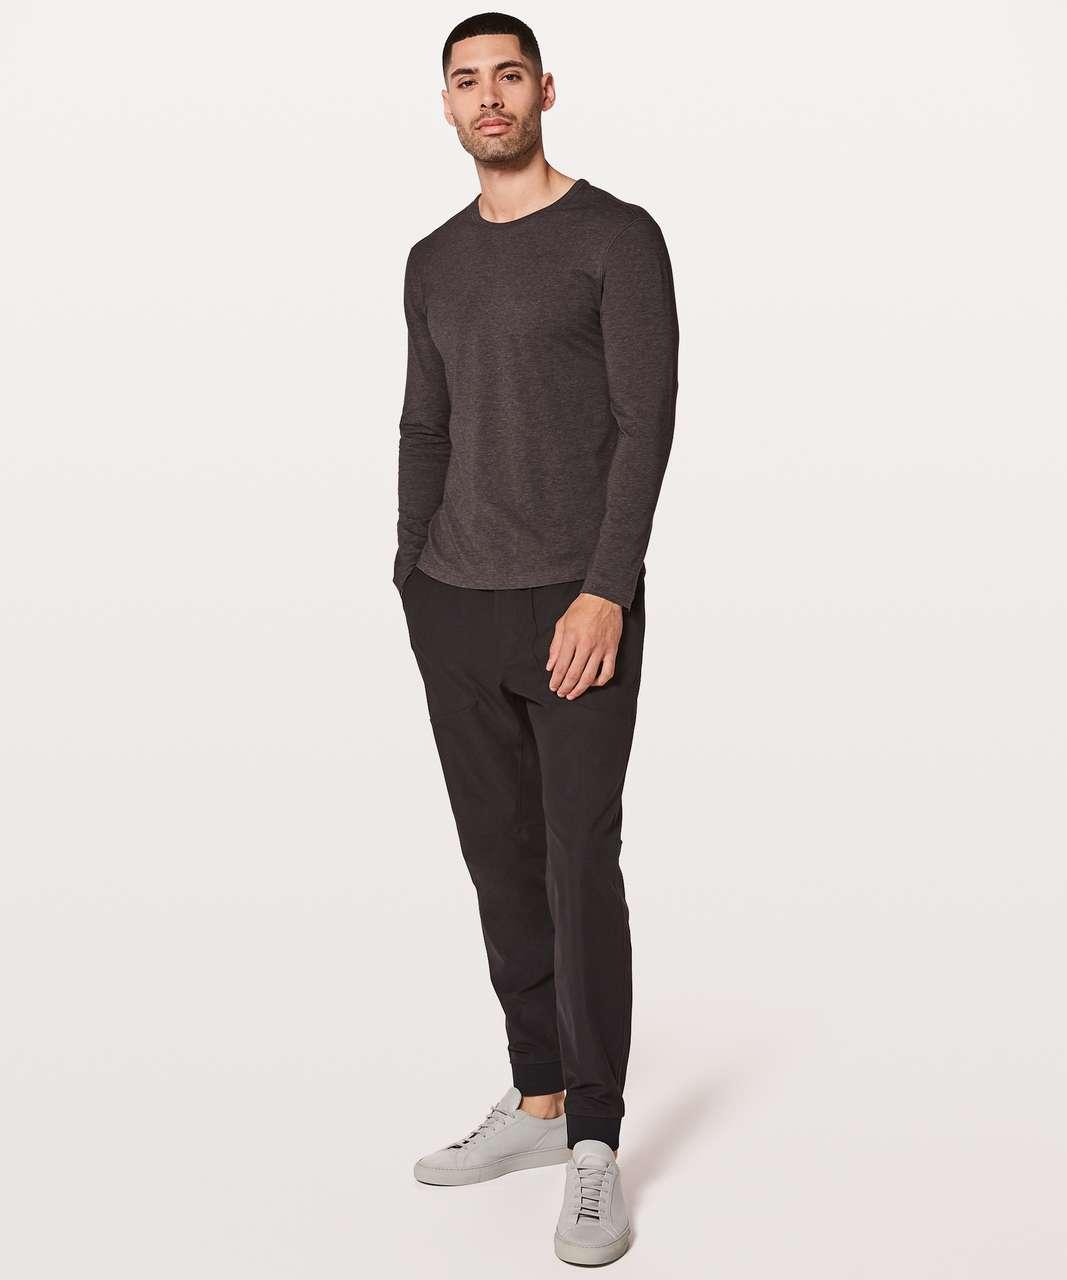 0252ac5de633 Lululemon 5 Year Basic Long Sleeve - Heathered Black Garnet - lulu ...